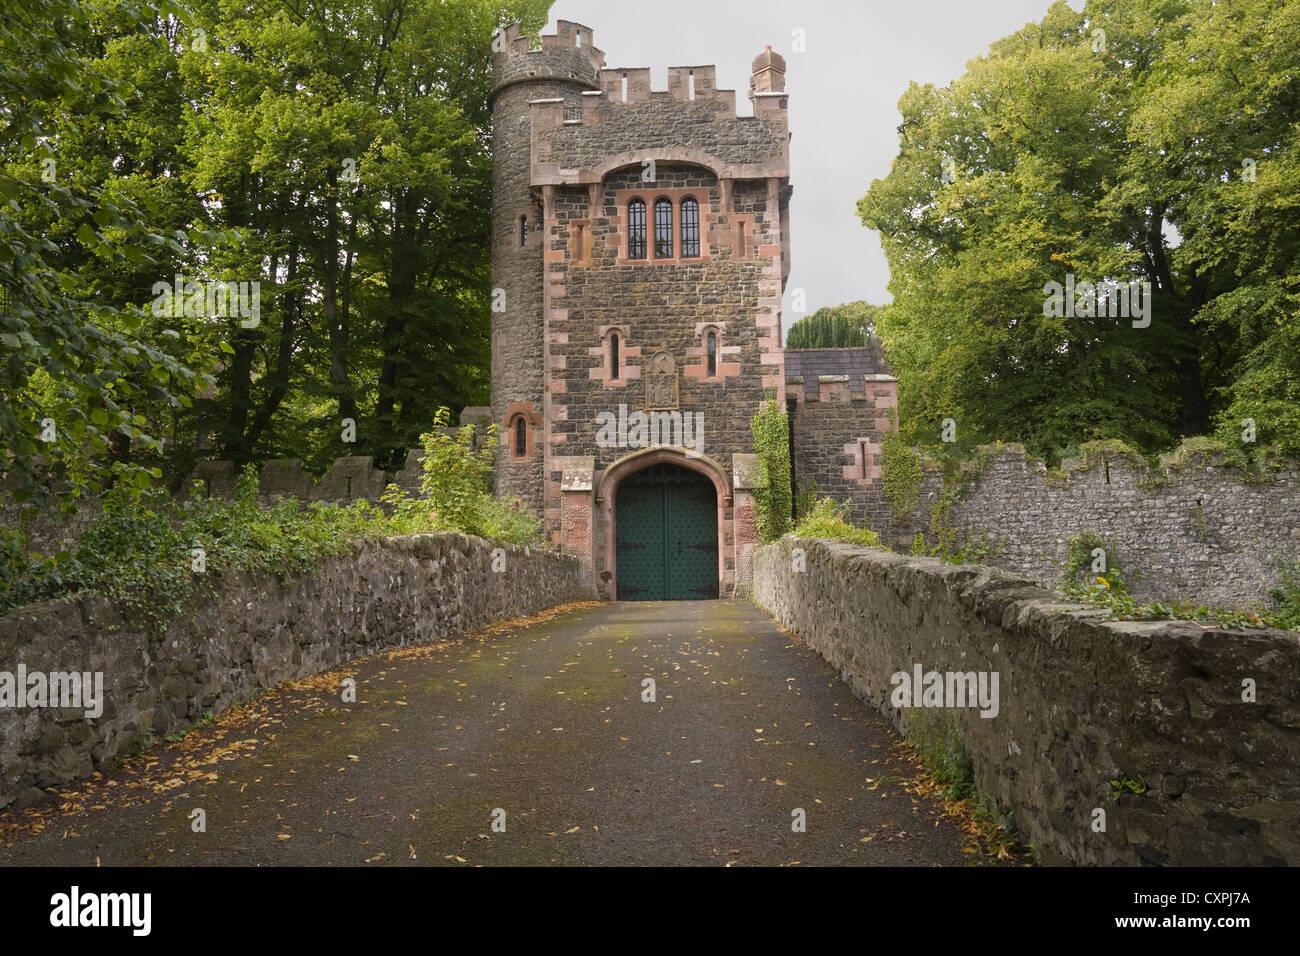 Glenarm Co Antrim Northern Ireland Castle gateway in appealing small village one of oldest glen settlements - Stock Image